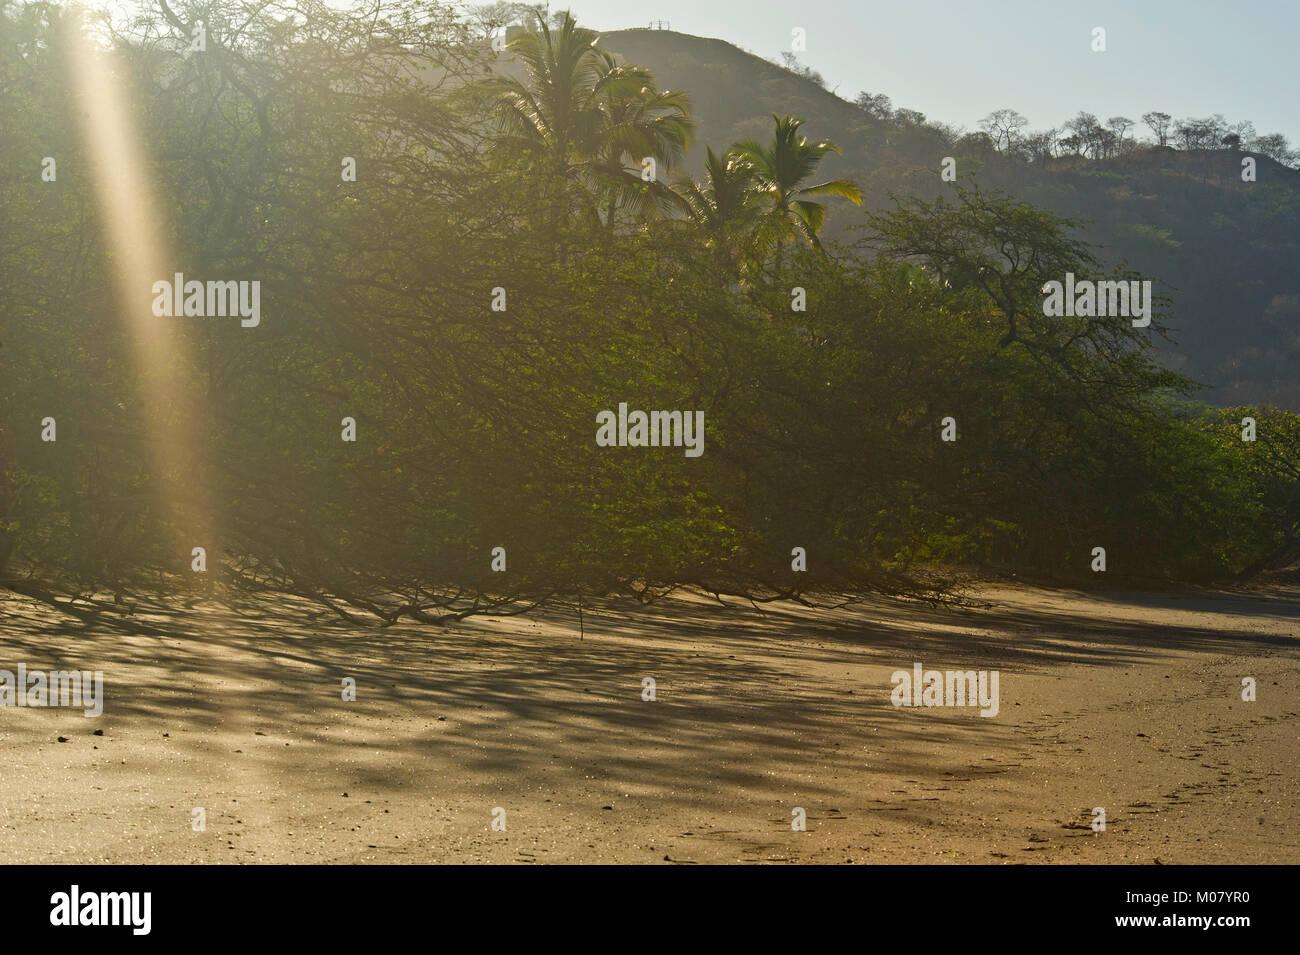 Sunrise on a black sand beach at Papagayo Bay. Stock Photo